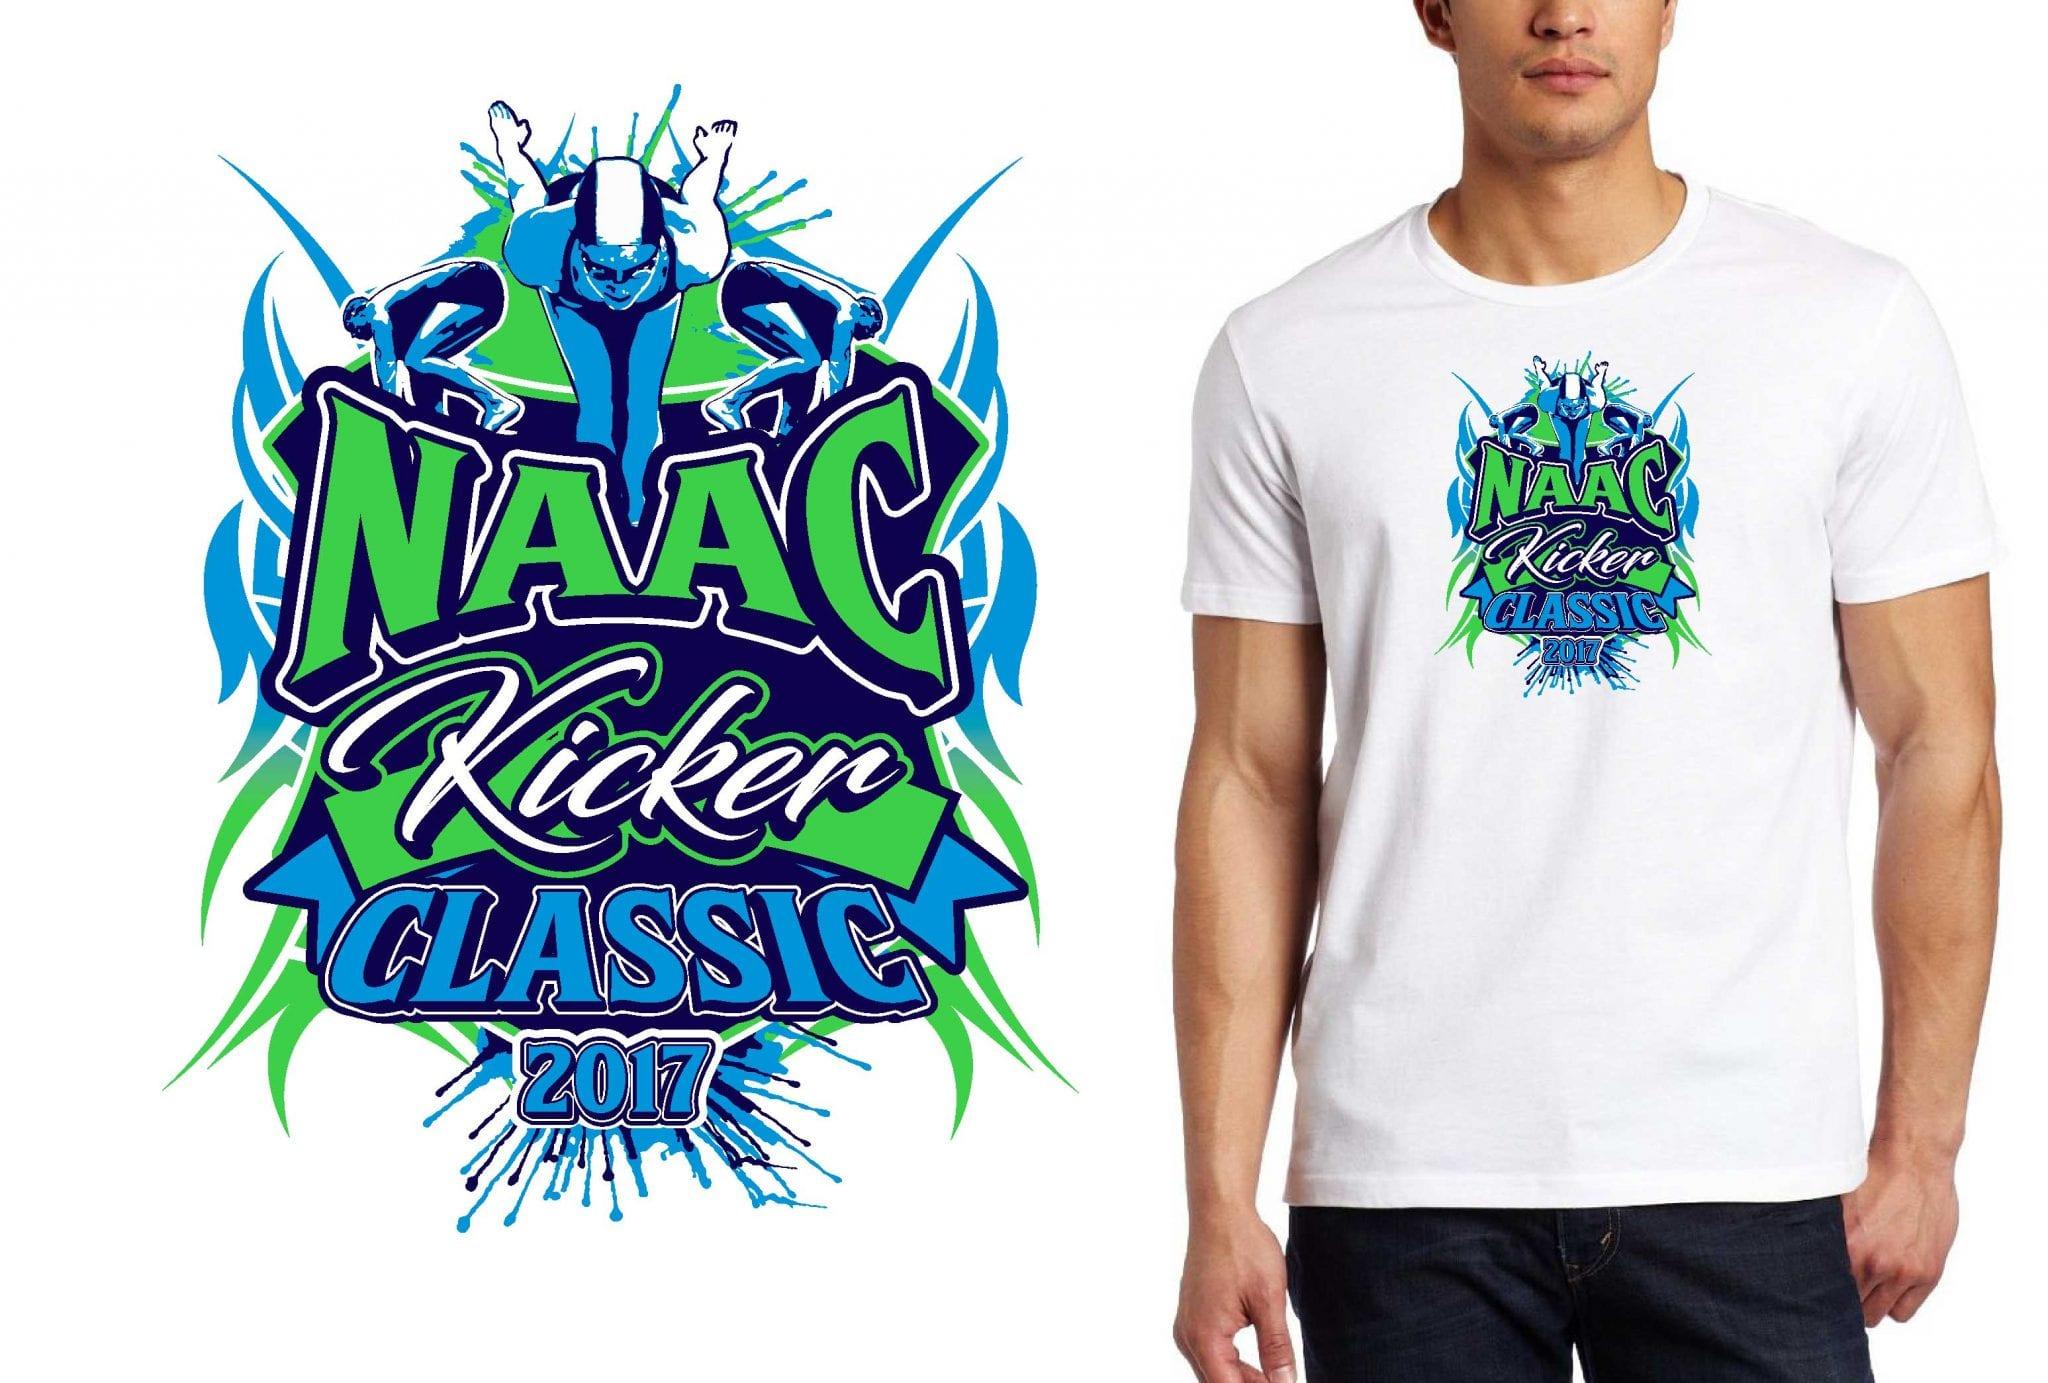 2017 NAAC Kicker Classic vector logo design for swimming t-shirt UrArtStudio